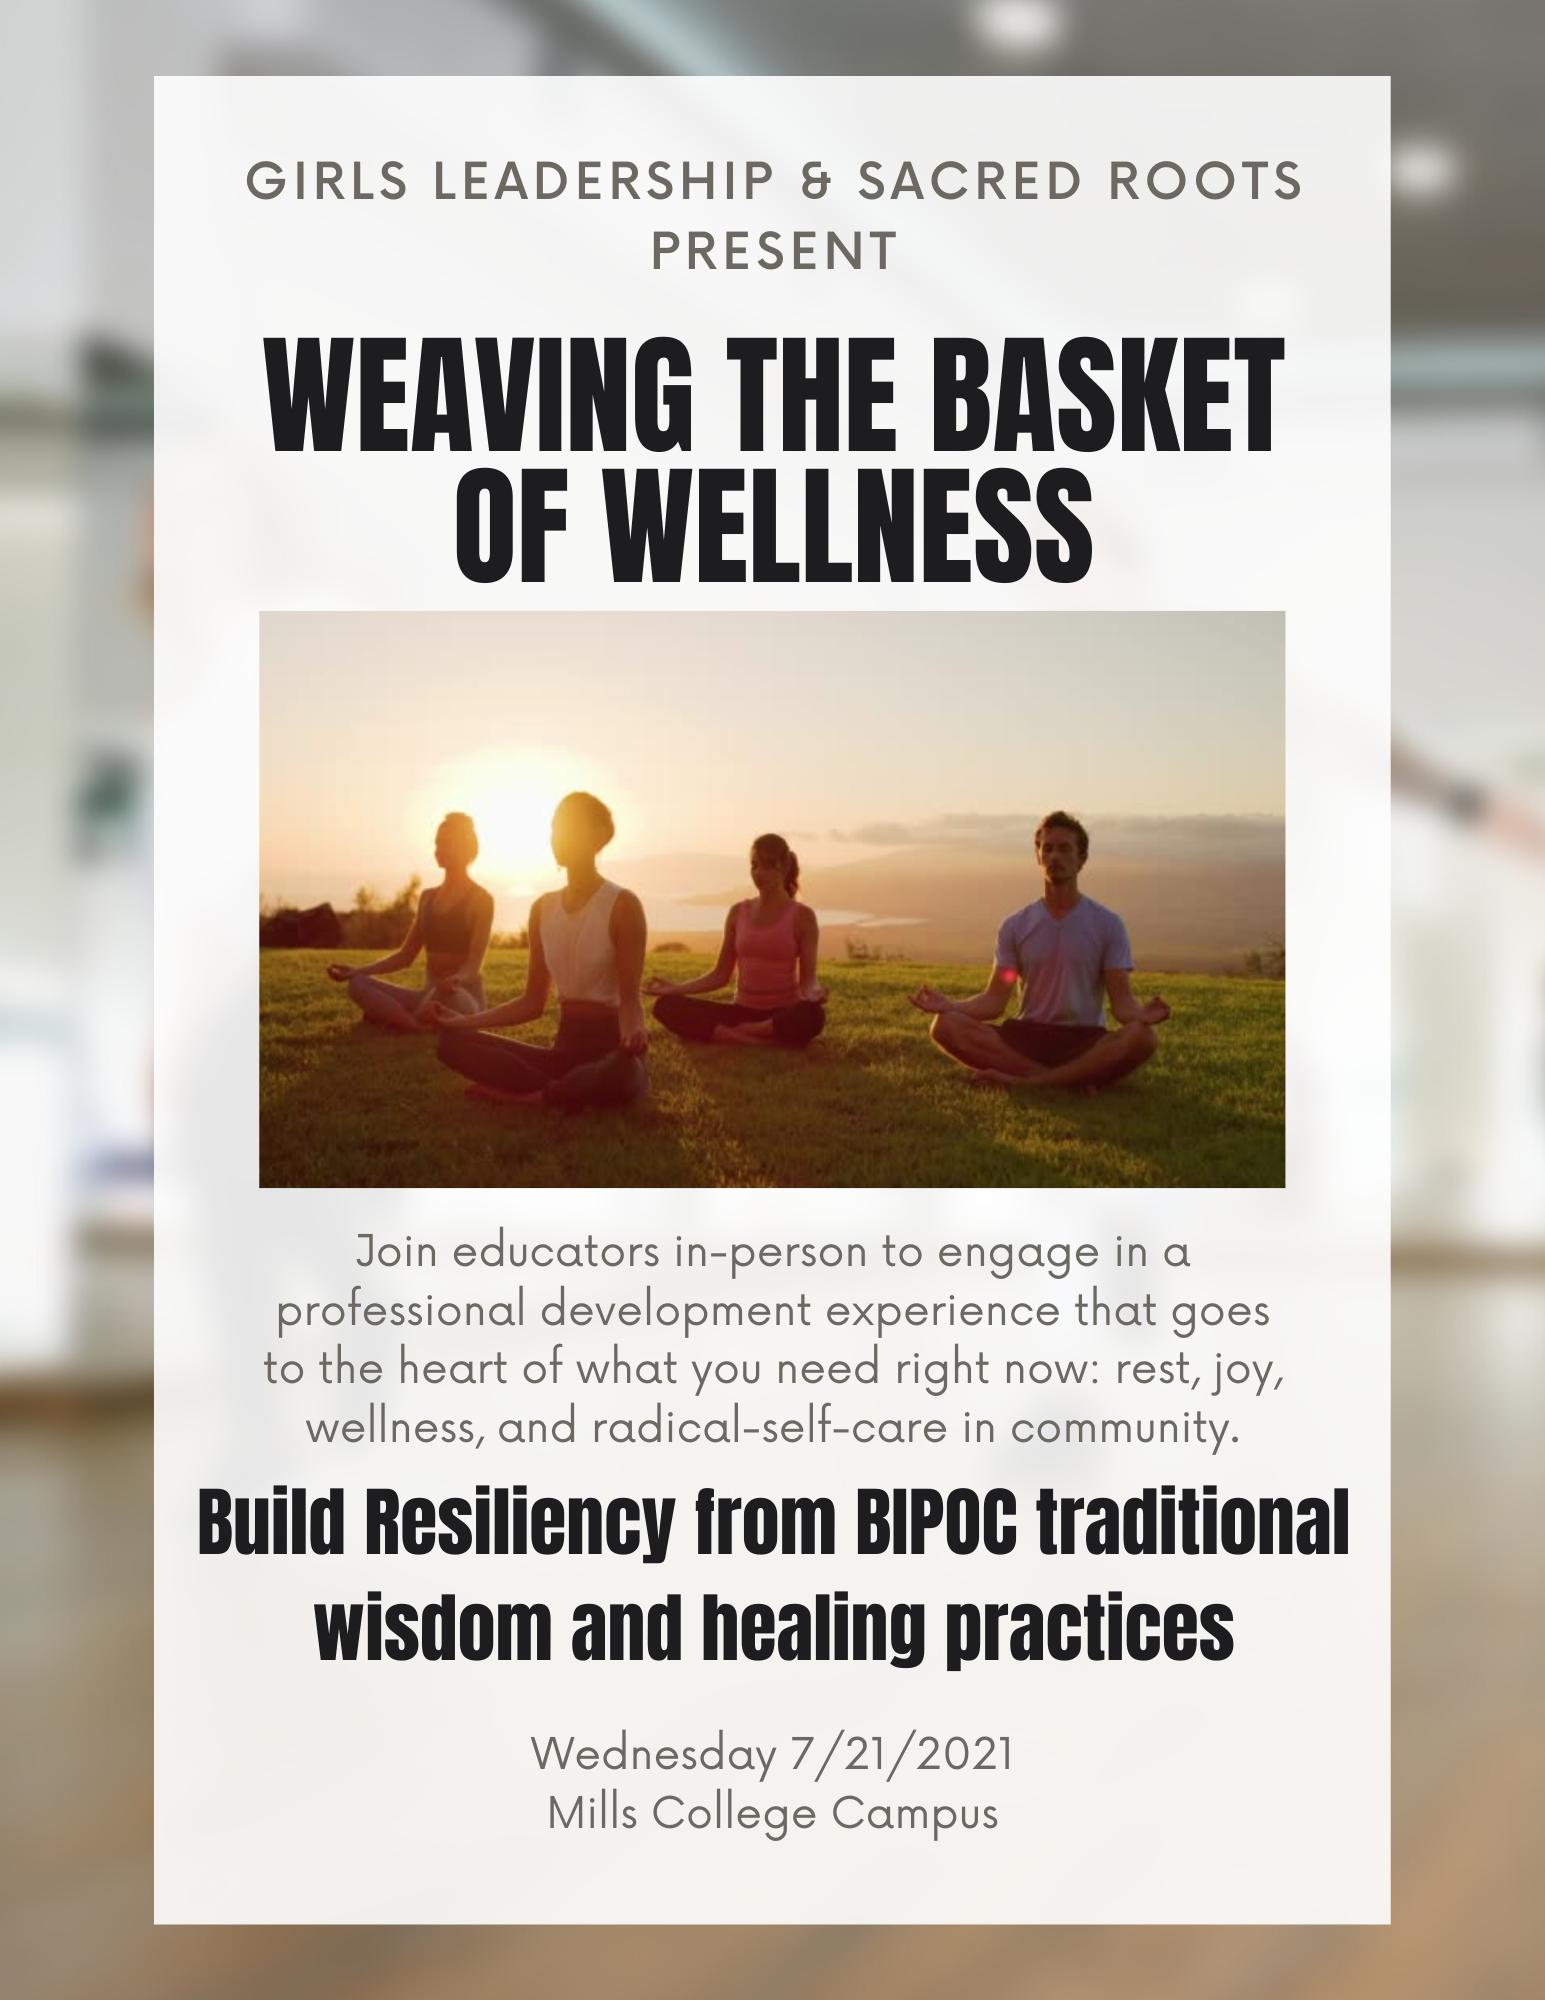 Weaving the Basket of Wellness